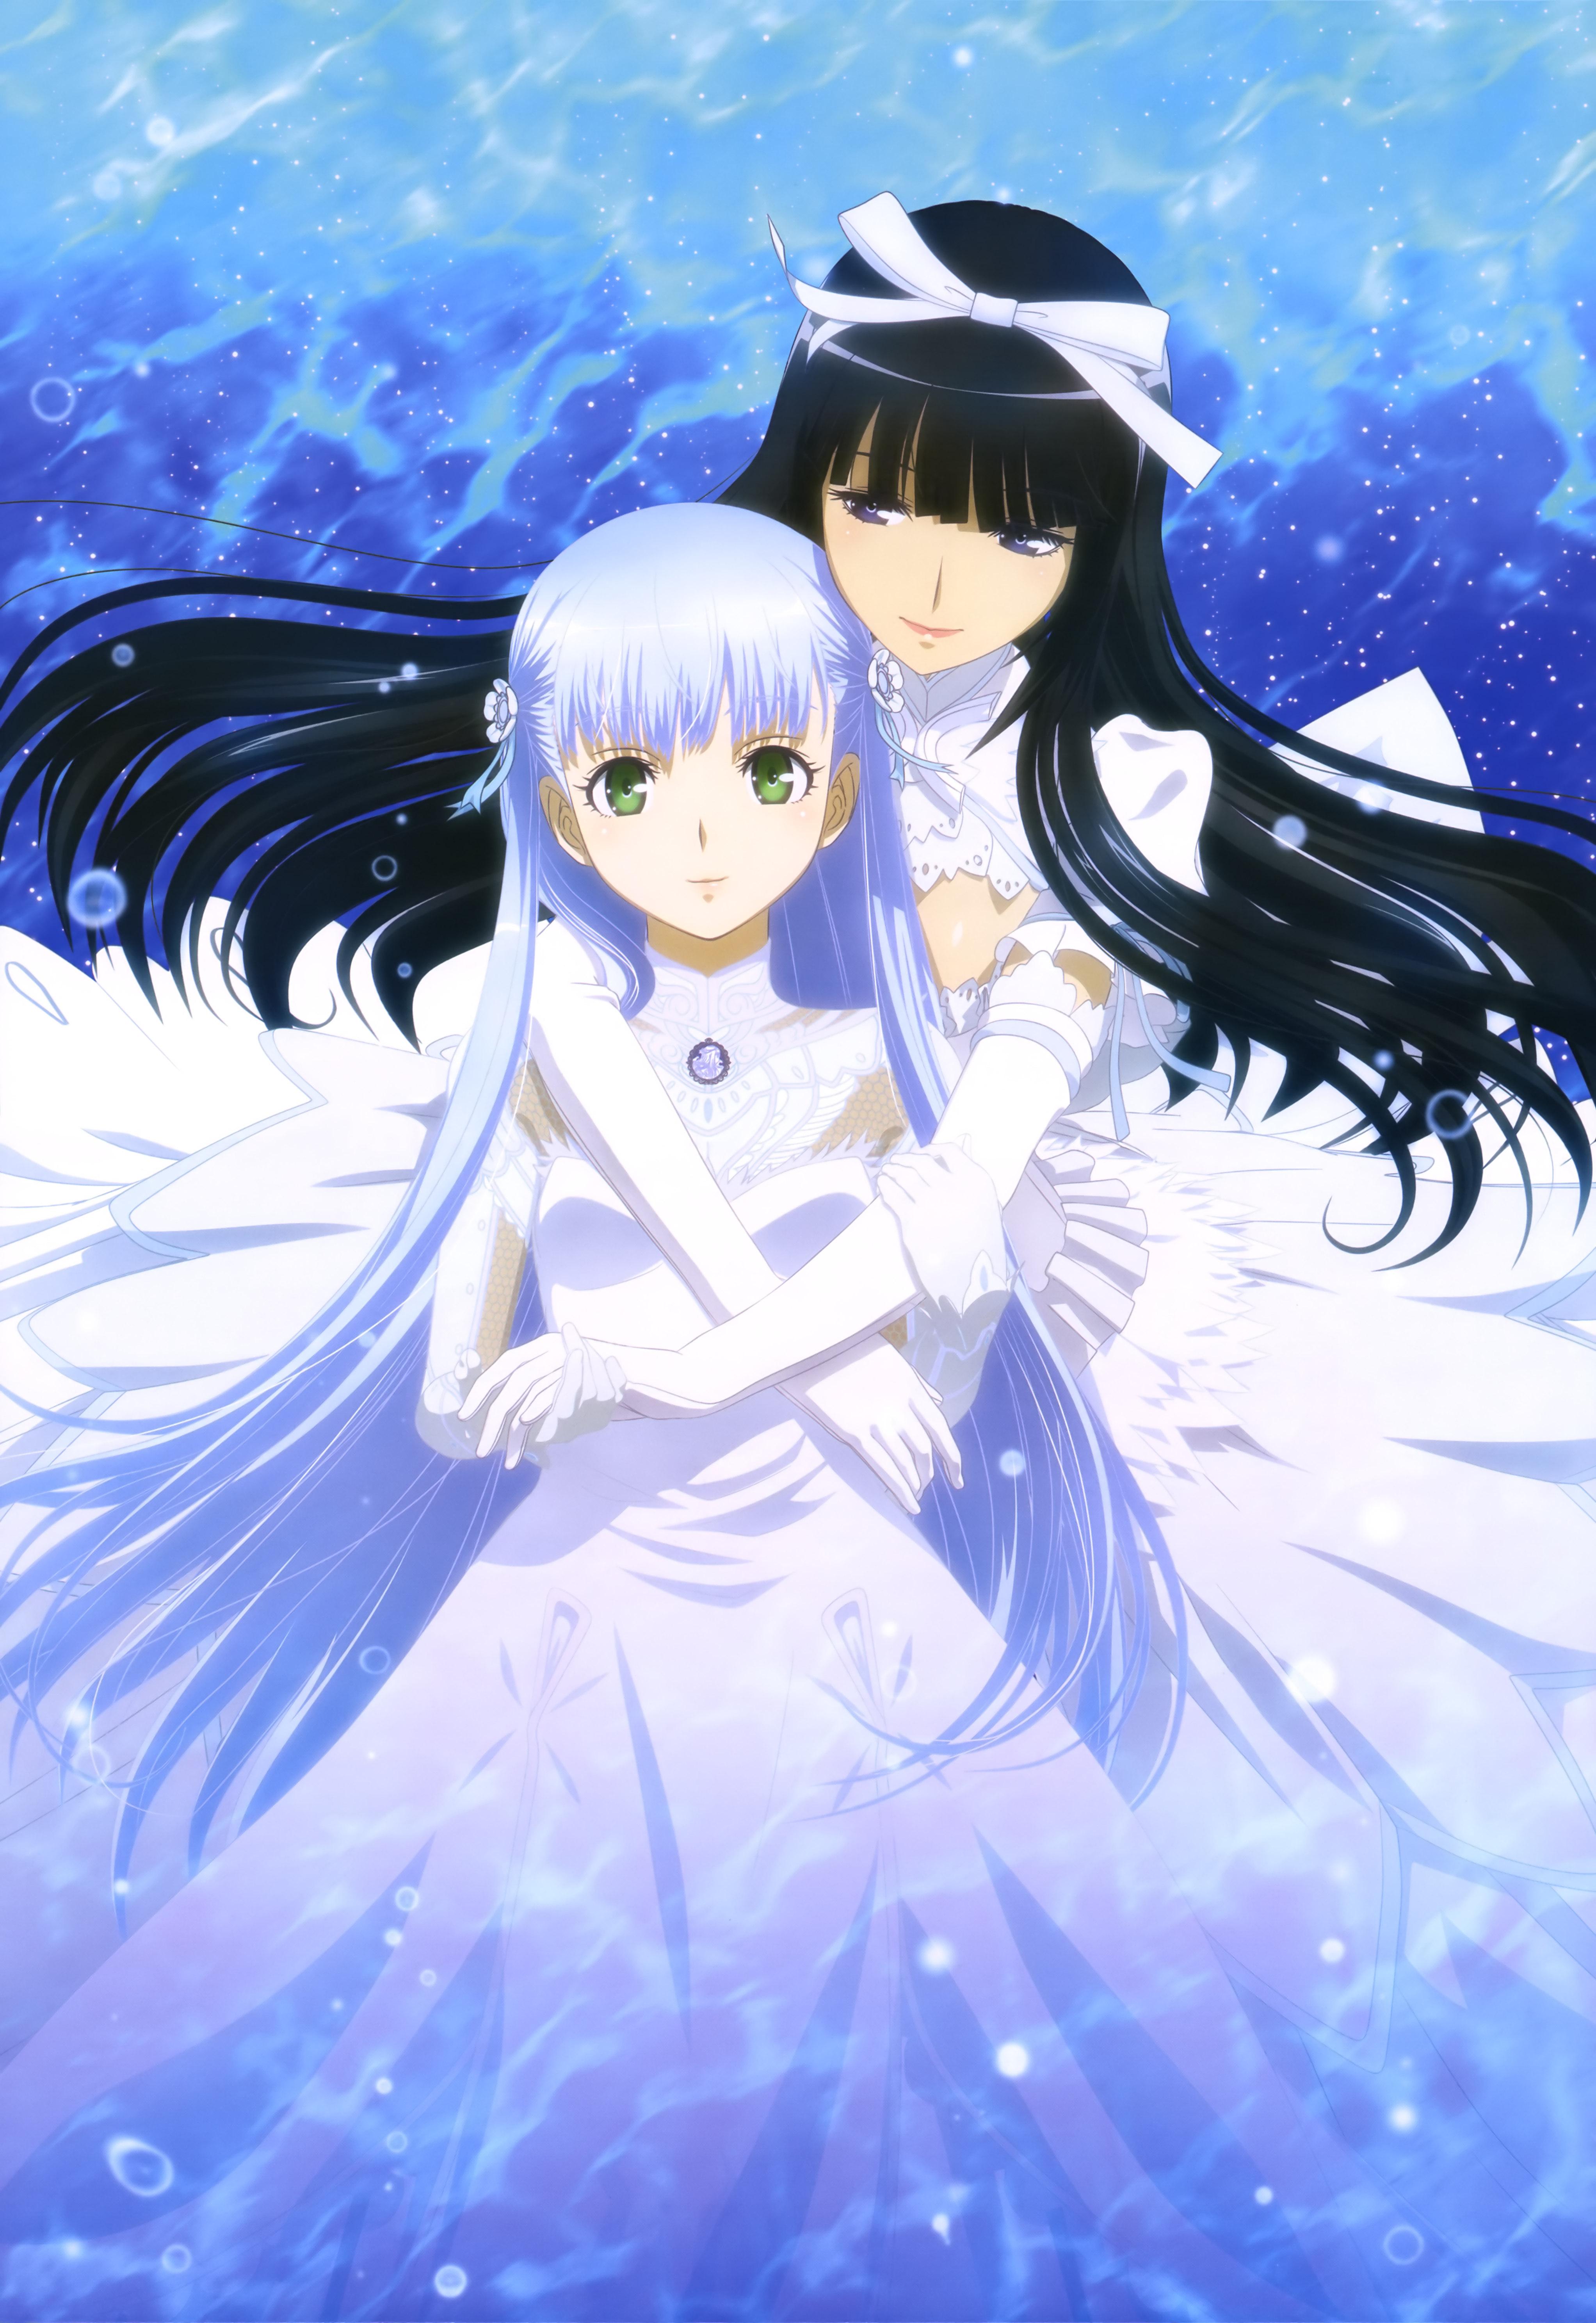 NyanType-Magazine-December-2015-anime-aoki hagane no arpeggio